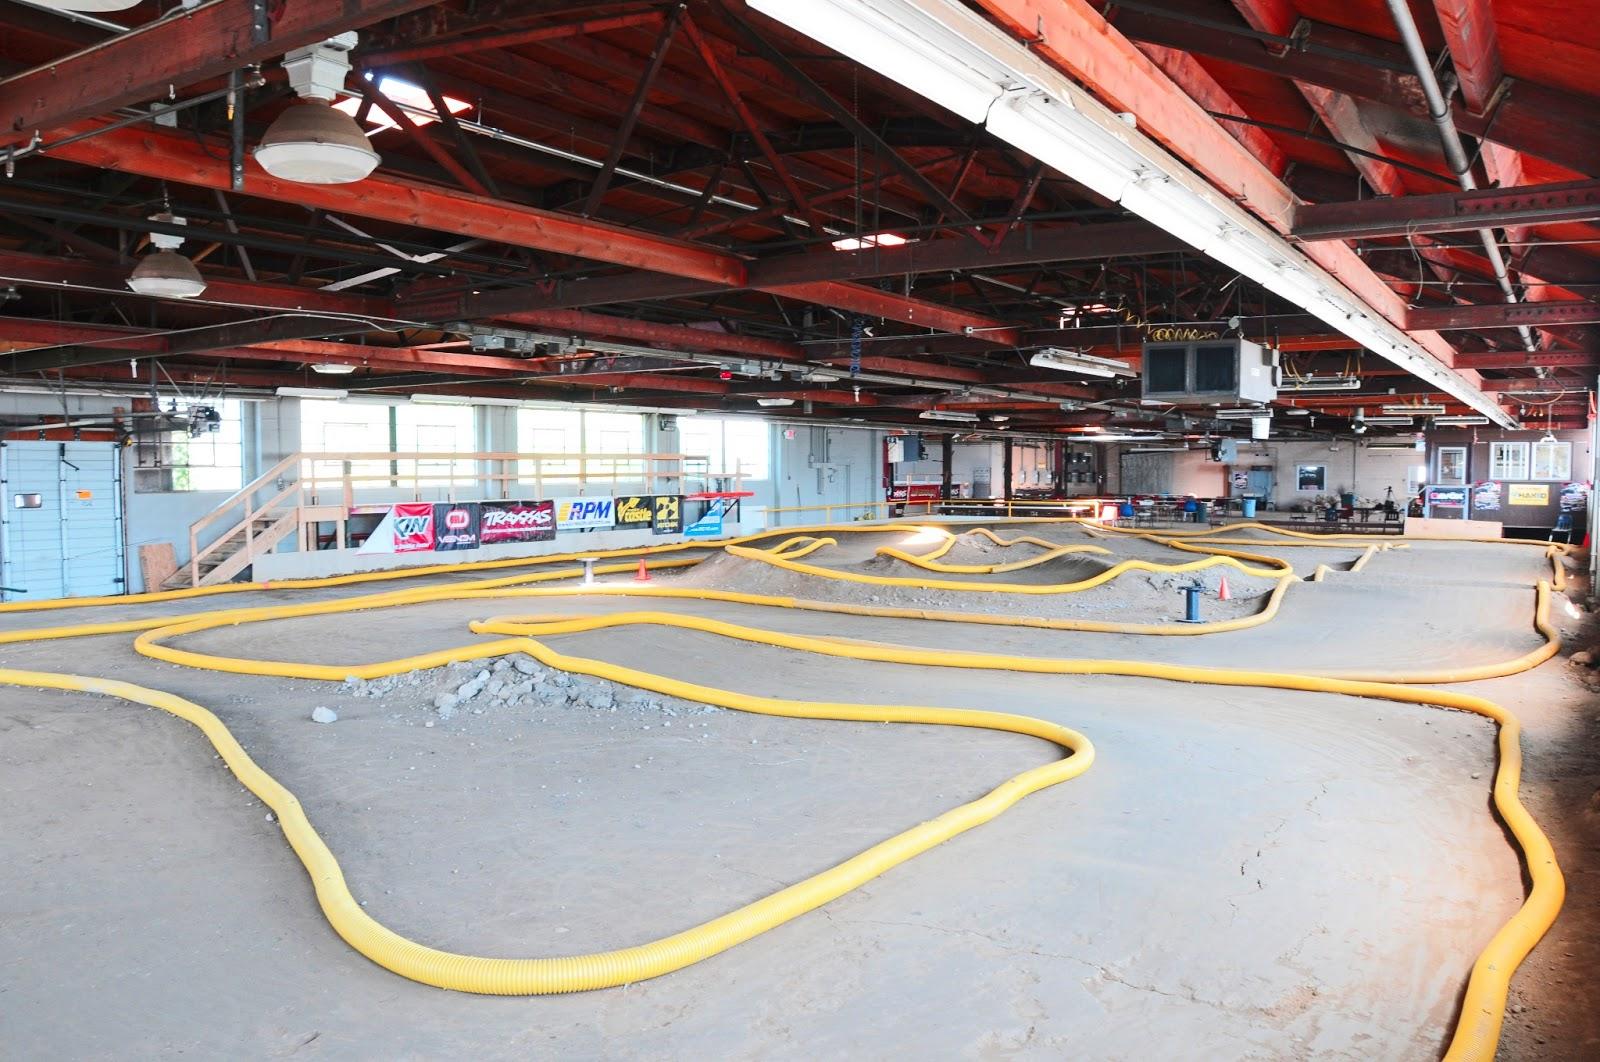 Rc Car Track: Indoor RC Car Race Track